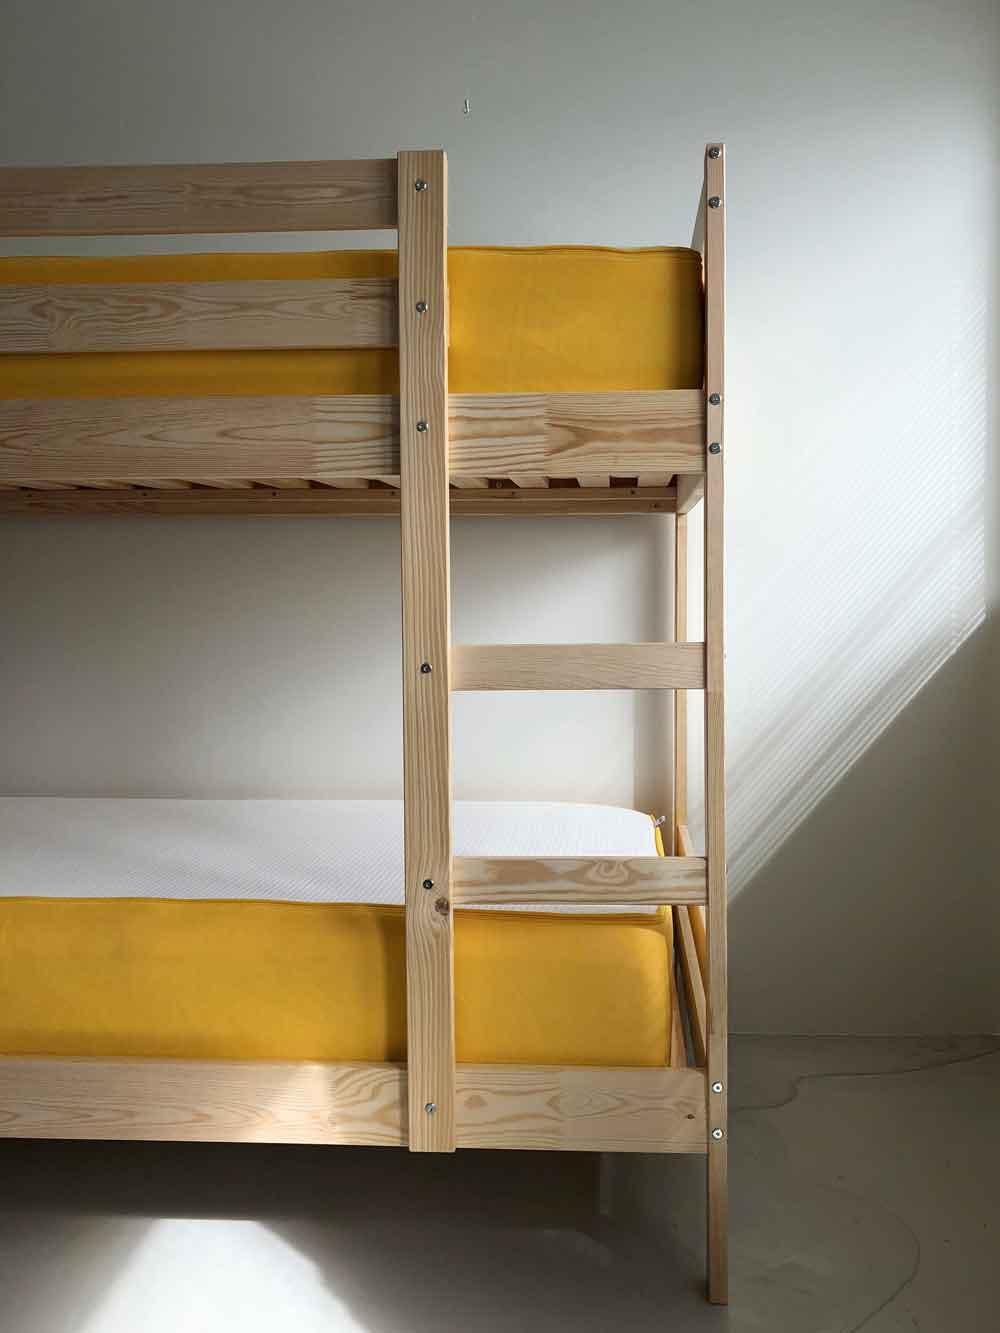 Stockbett Ikea Hack Holzbett - DIY | ein Stockbett aus Holz einfach selber machen